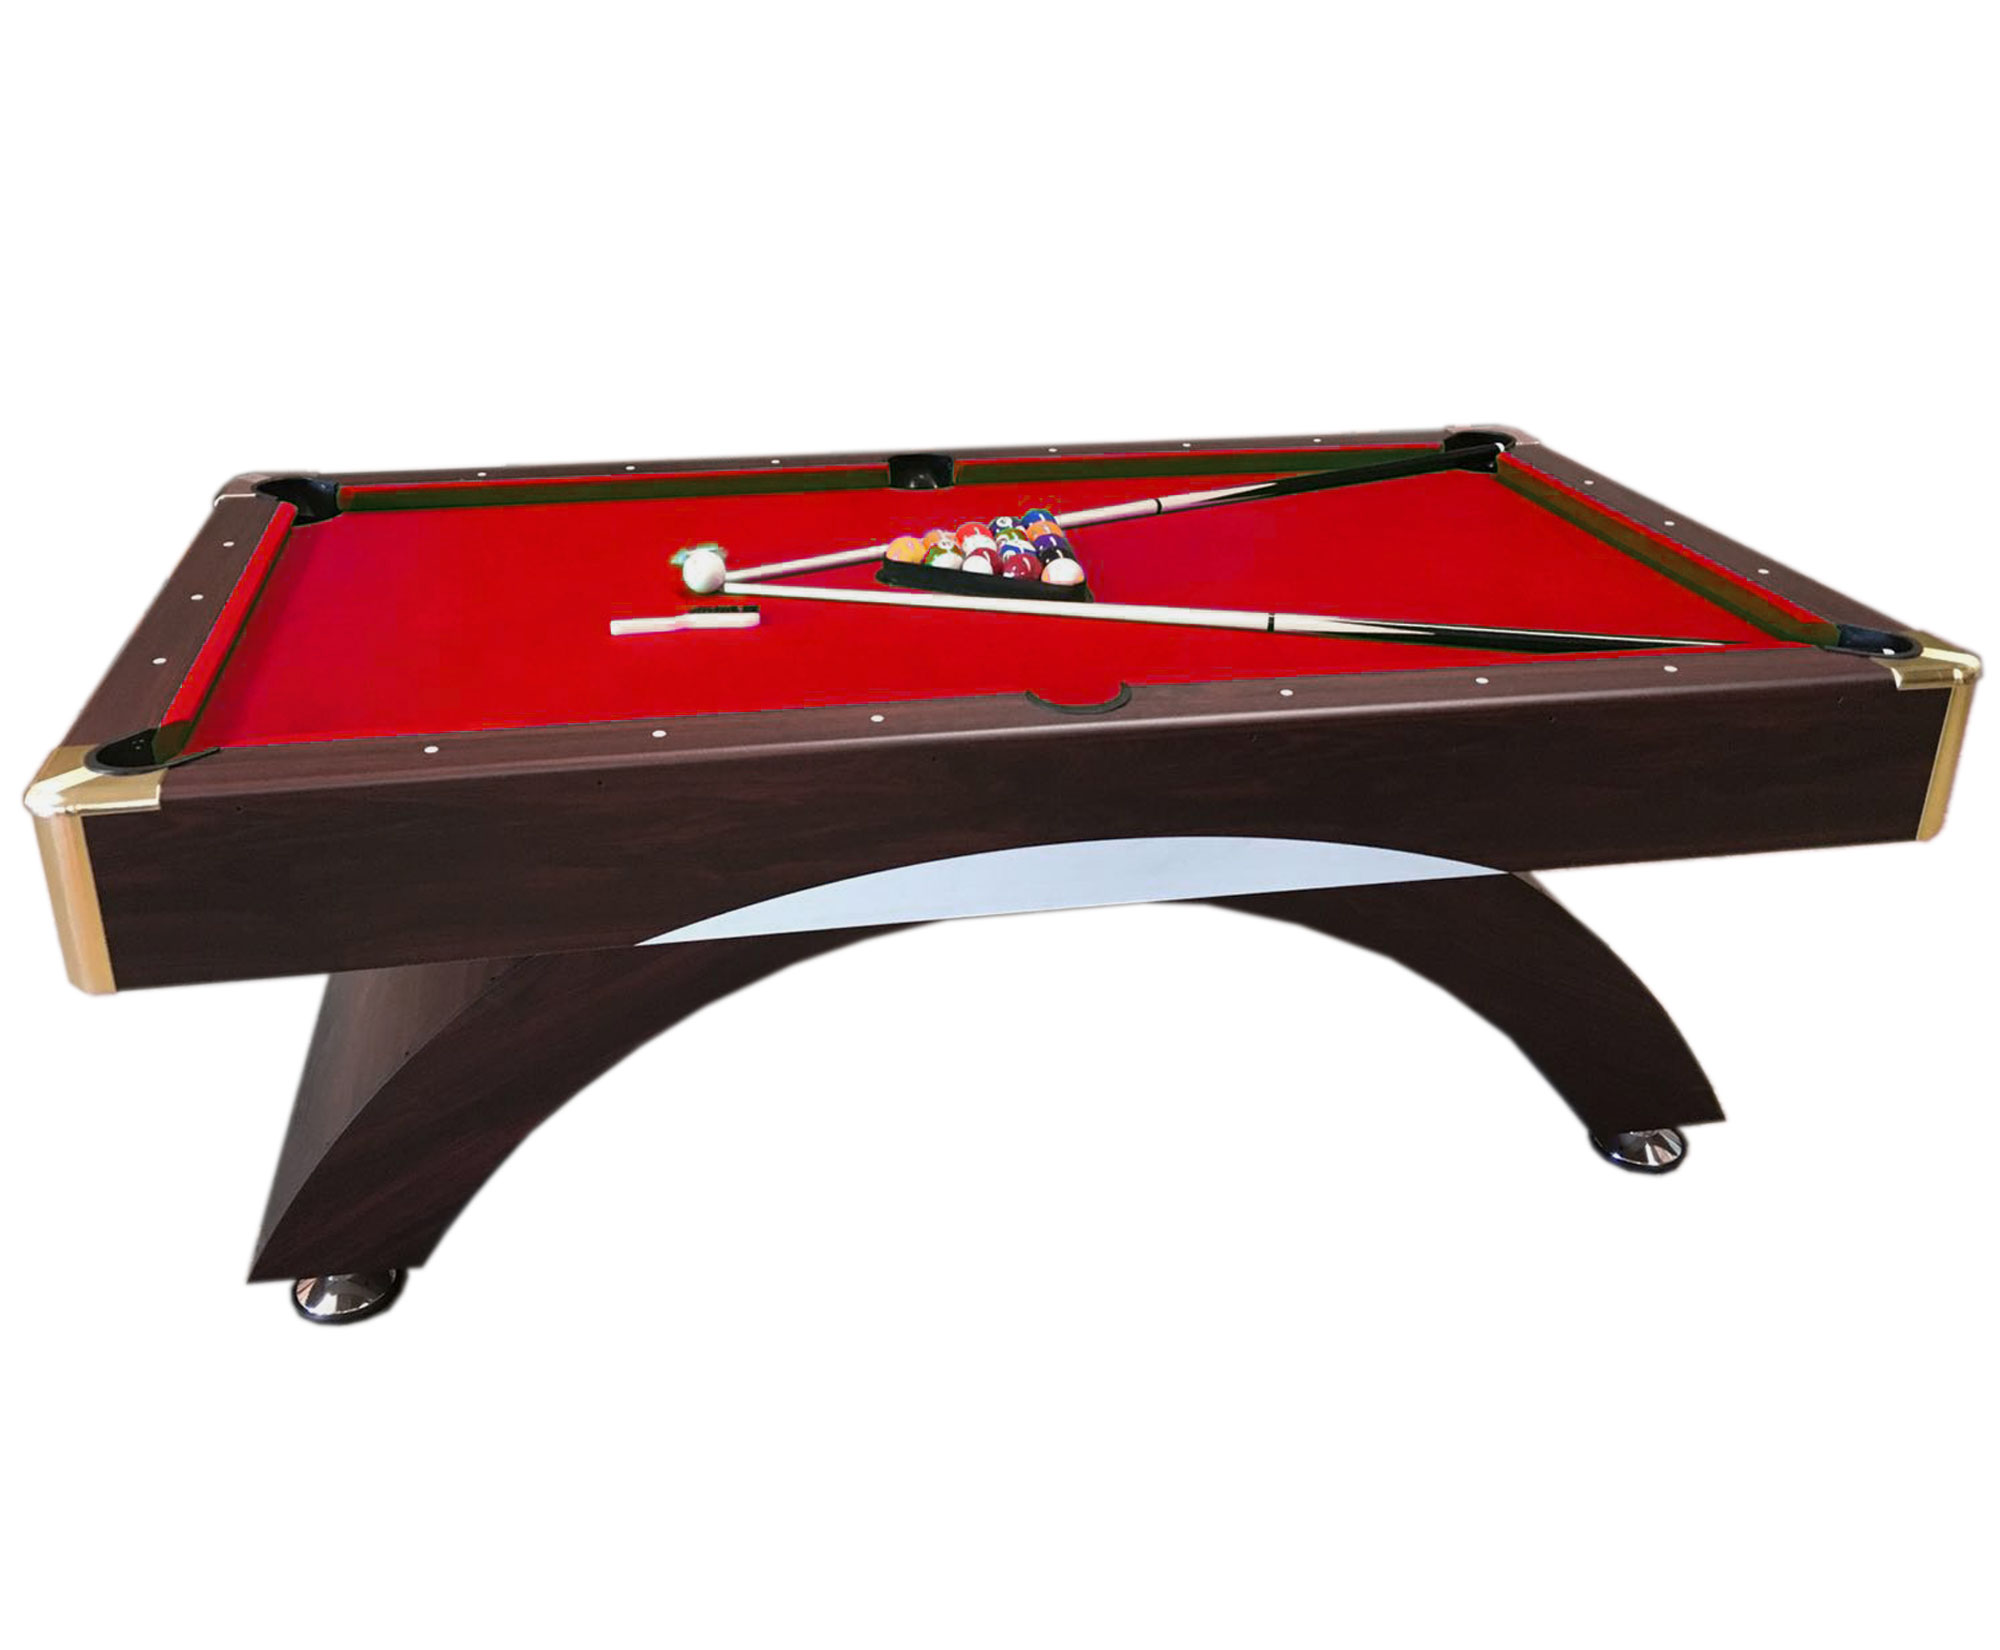 Brunswick Regulation Size Pool Table 28